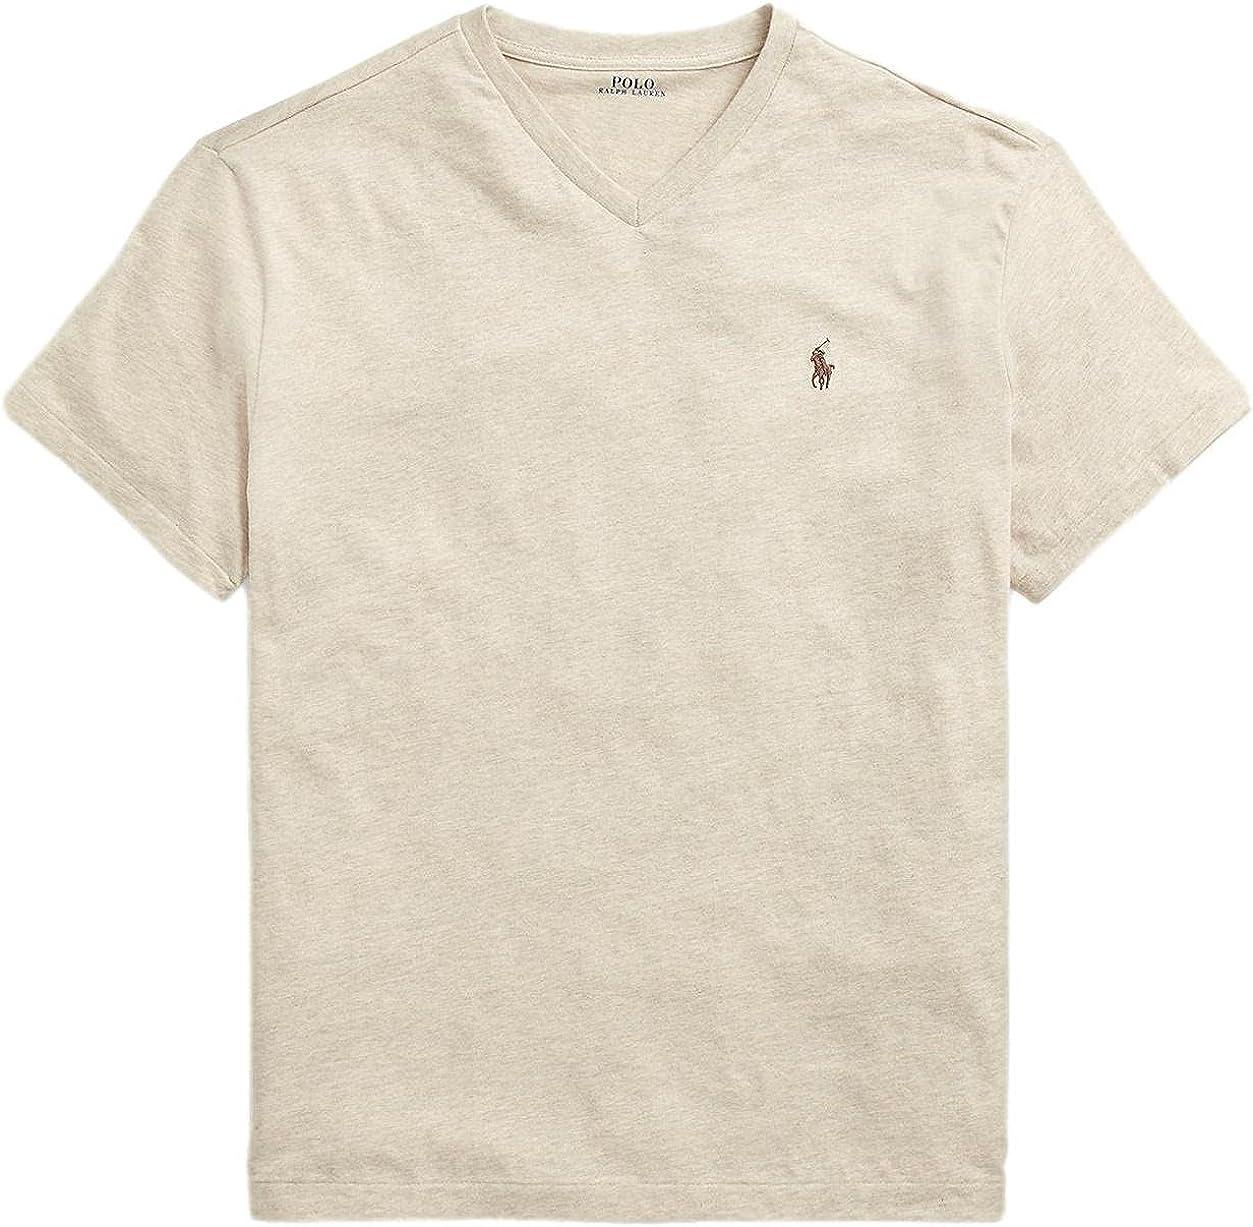 Polo RL Men's Classic Fit V-Neck T-Shirt